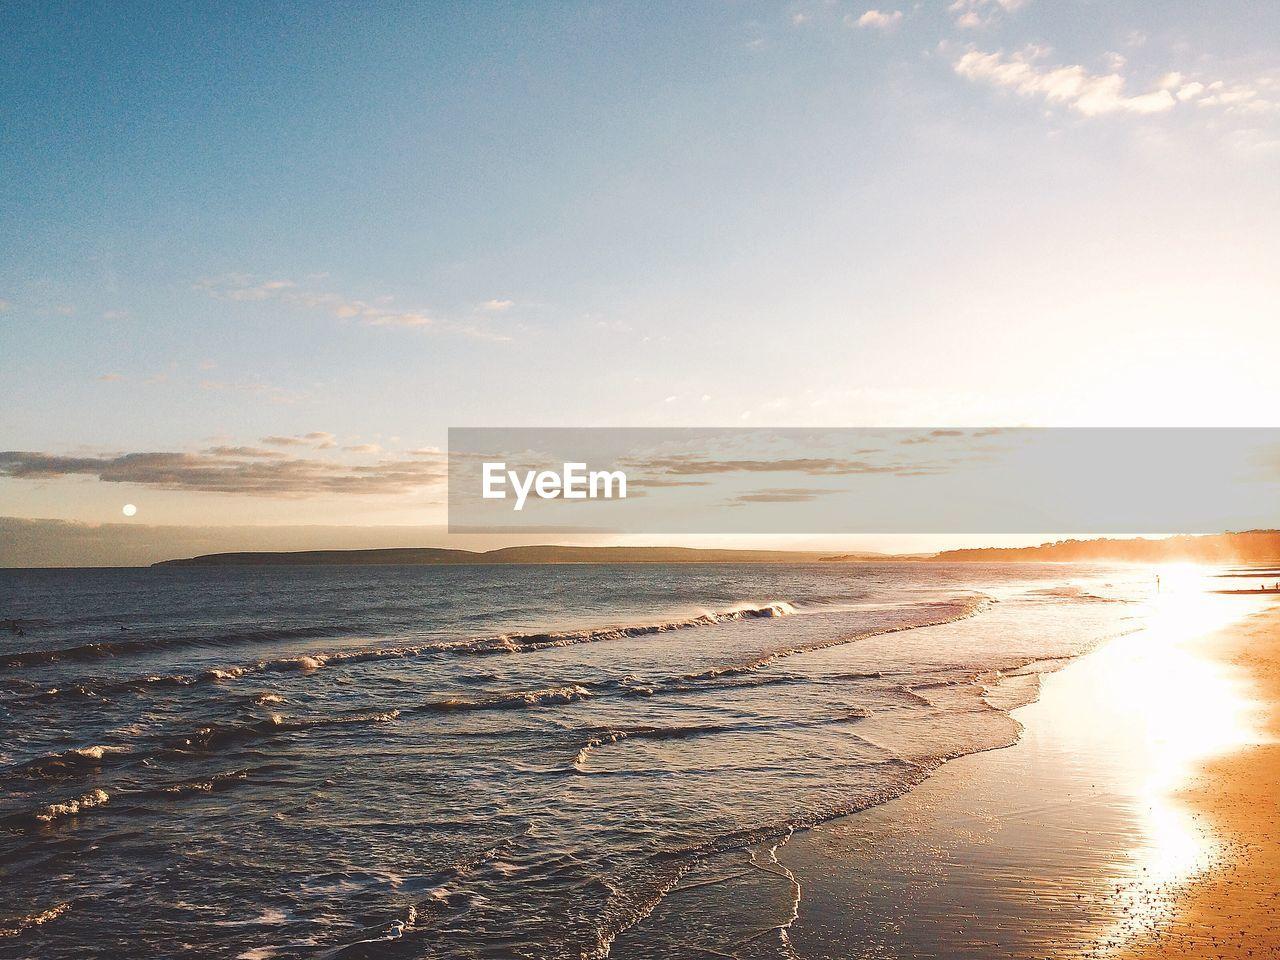 sky, water, beauty in nature, sea, scenics - nature, beach, land, tranquility, tranquil scene, cloud - sky, sunset, nature, idyllic, wave, non-urban scene, sunlight, no people, outdoors, horizon, bright